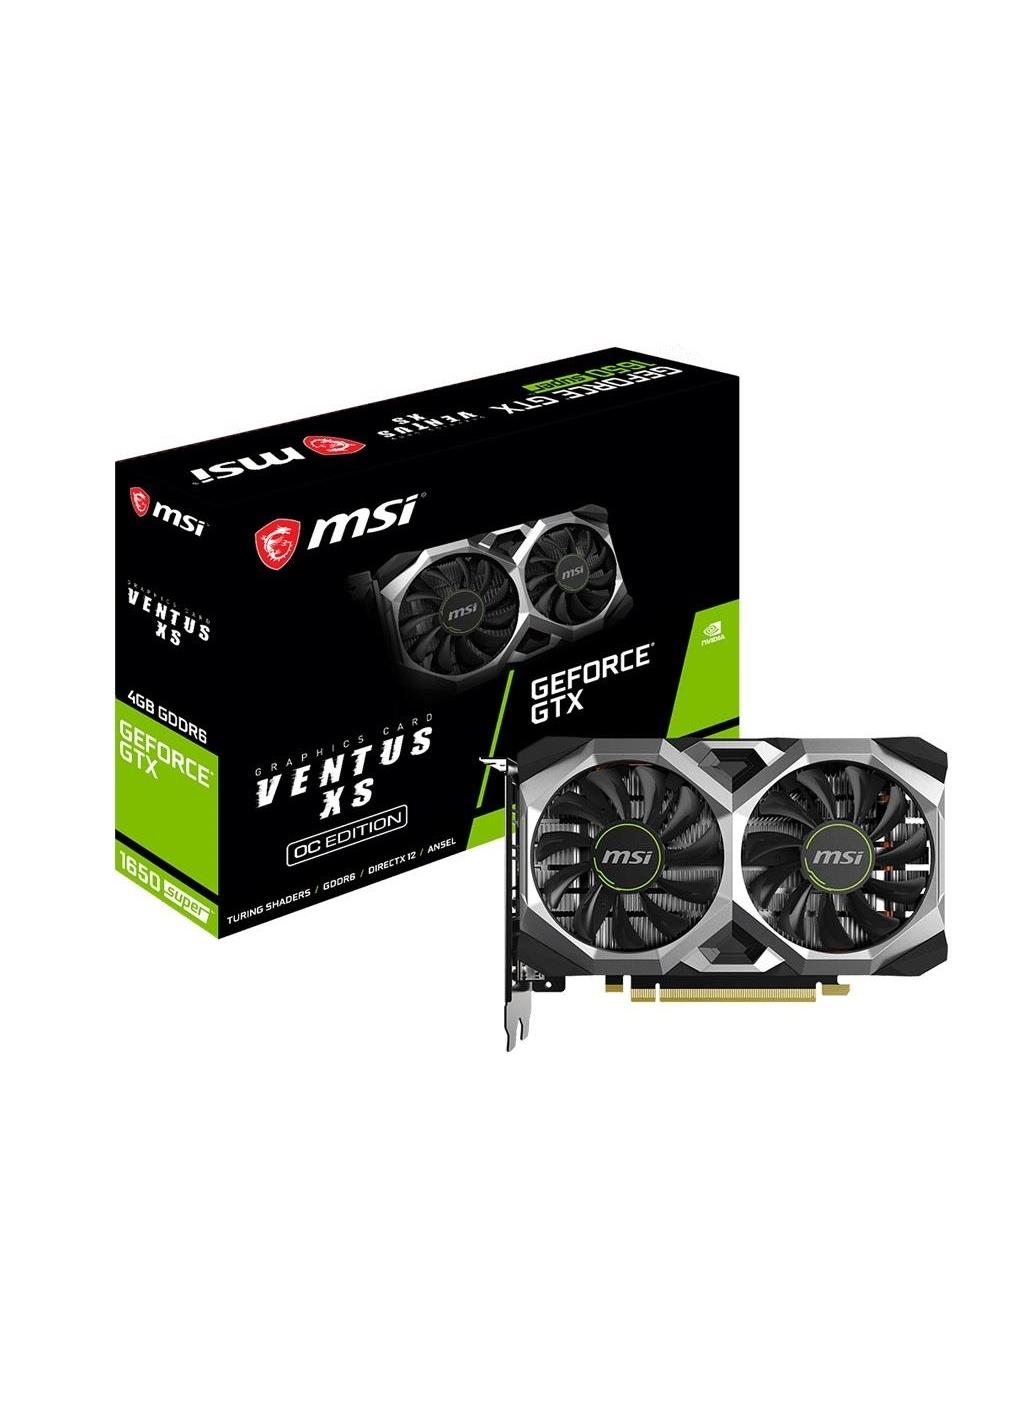 Standart MSI Vga Geforce Gtx1650 Super Ventus Xs Oc 4Gb Gddr6 128B Dx12 Pcıe 3.0 X16 (1Xhdmı 3Xdp)Ekran Kartı